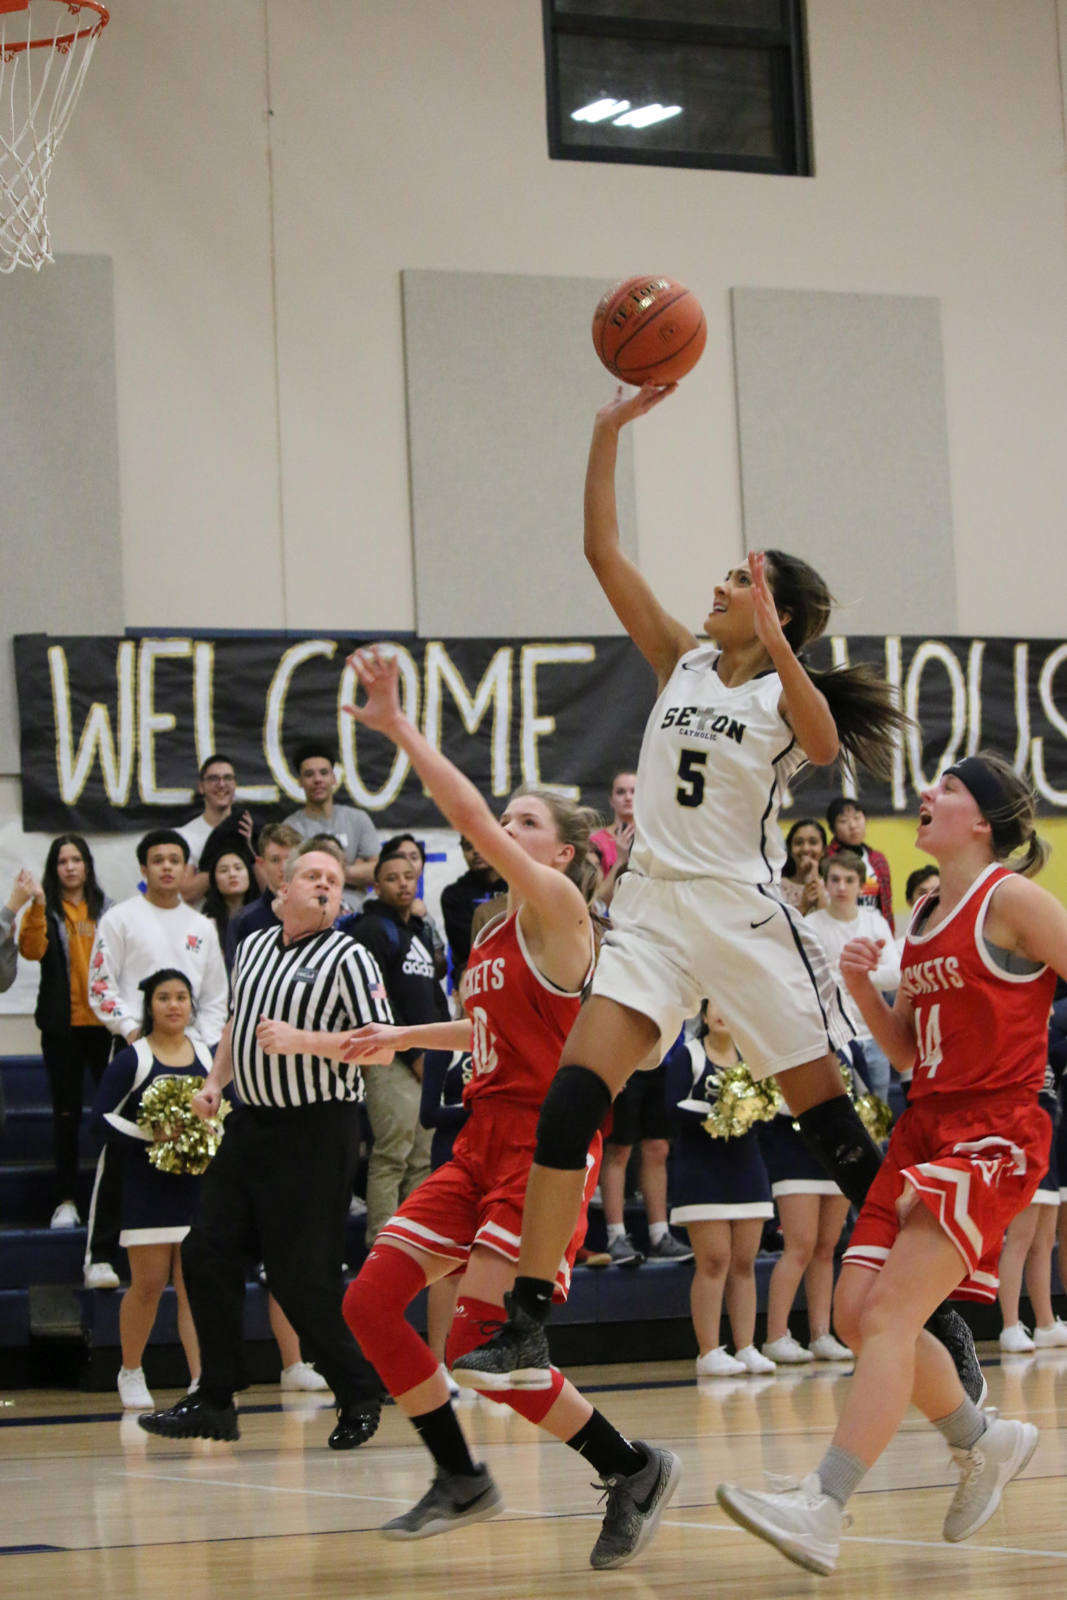 Jasmine Morgan Nominated For Columbian Newspaper's All Region Girls Basketball Team